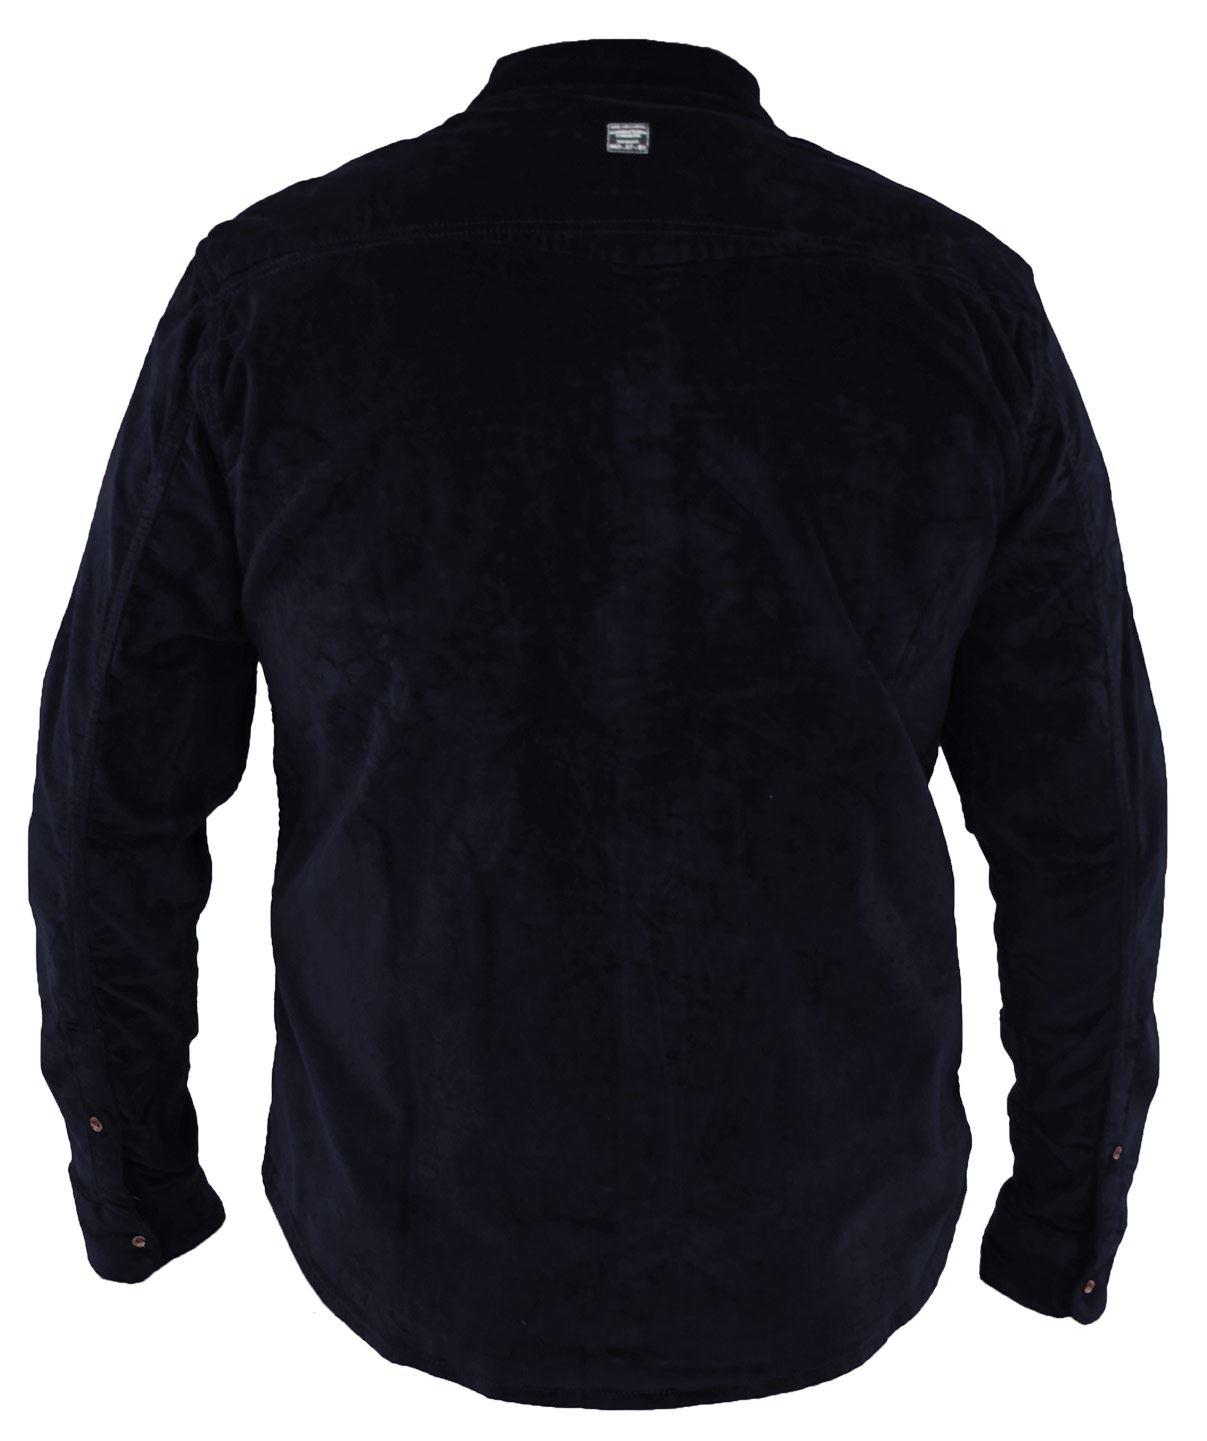 Mens-Corduroy-Cotton-Shirt-Long-Sleeve-Casual-Shirts-Jacksouth-Jacket-Top-S-2XL thumbnail 27